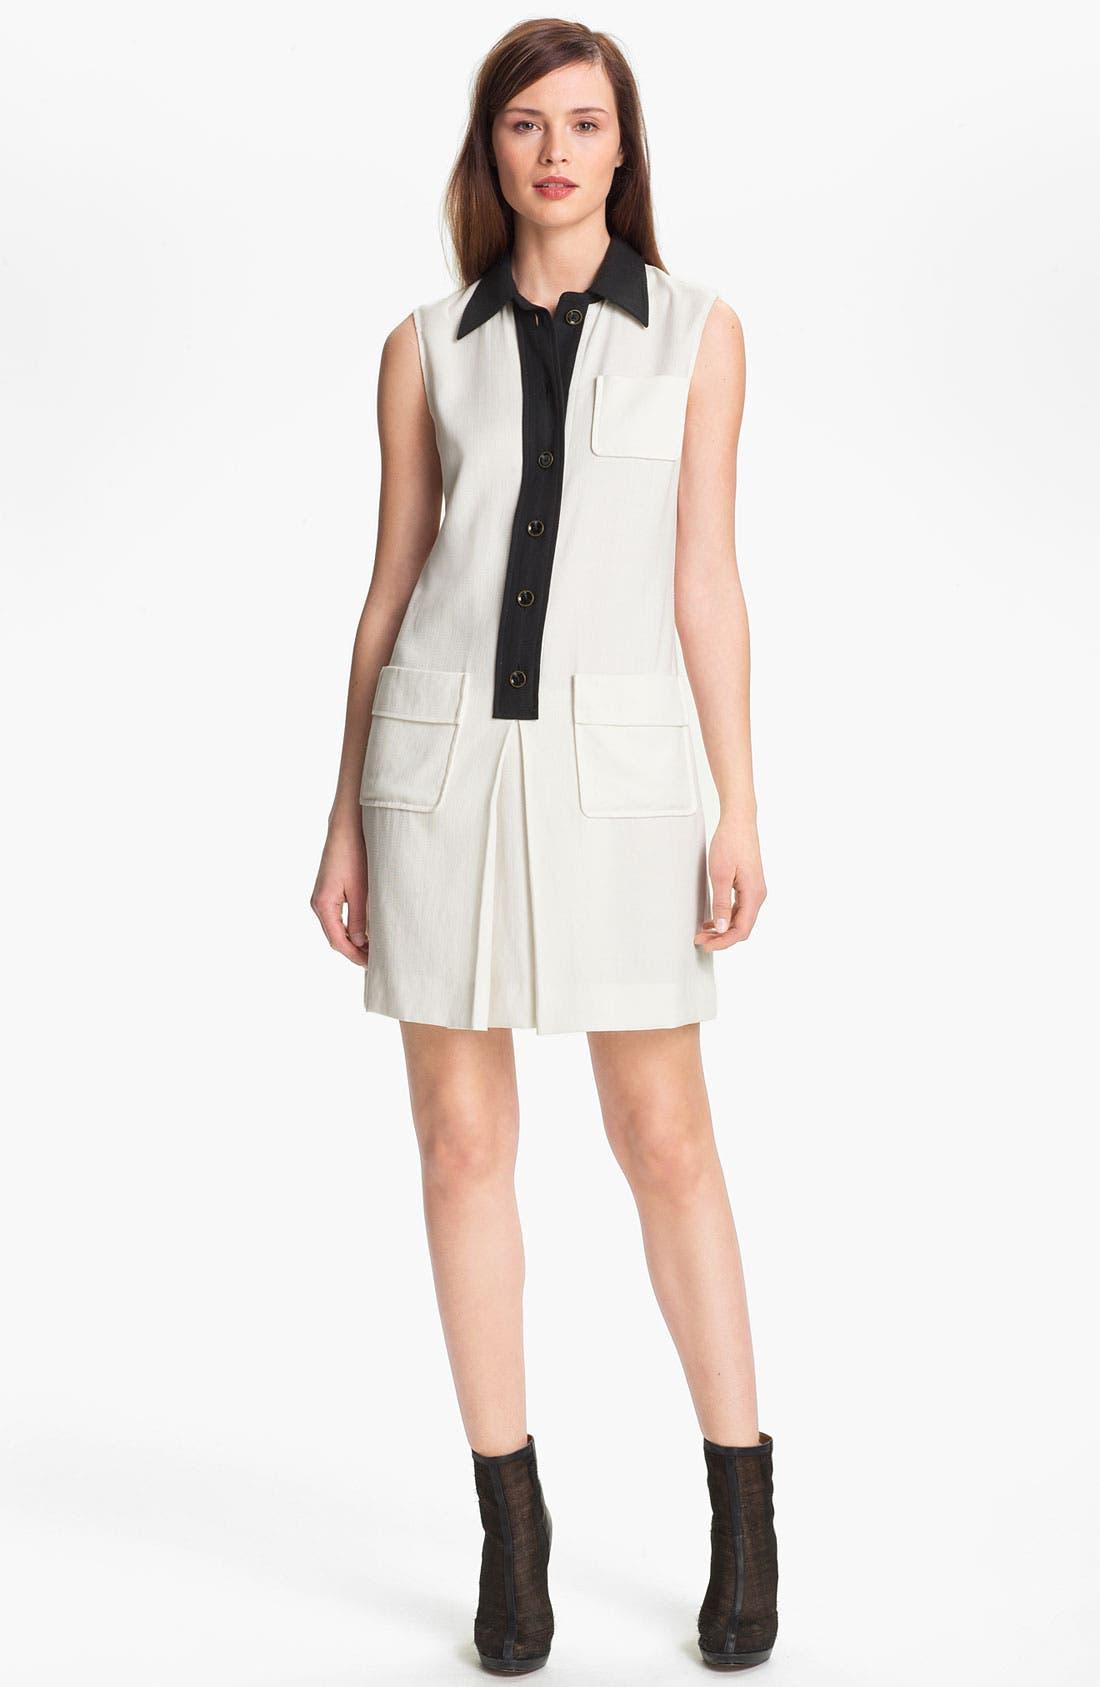 Alternate Image 1 Selected - Rachel Zoe 'Rosie' Sleeveless Shirtdress